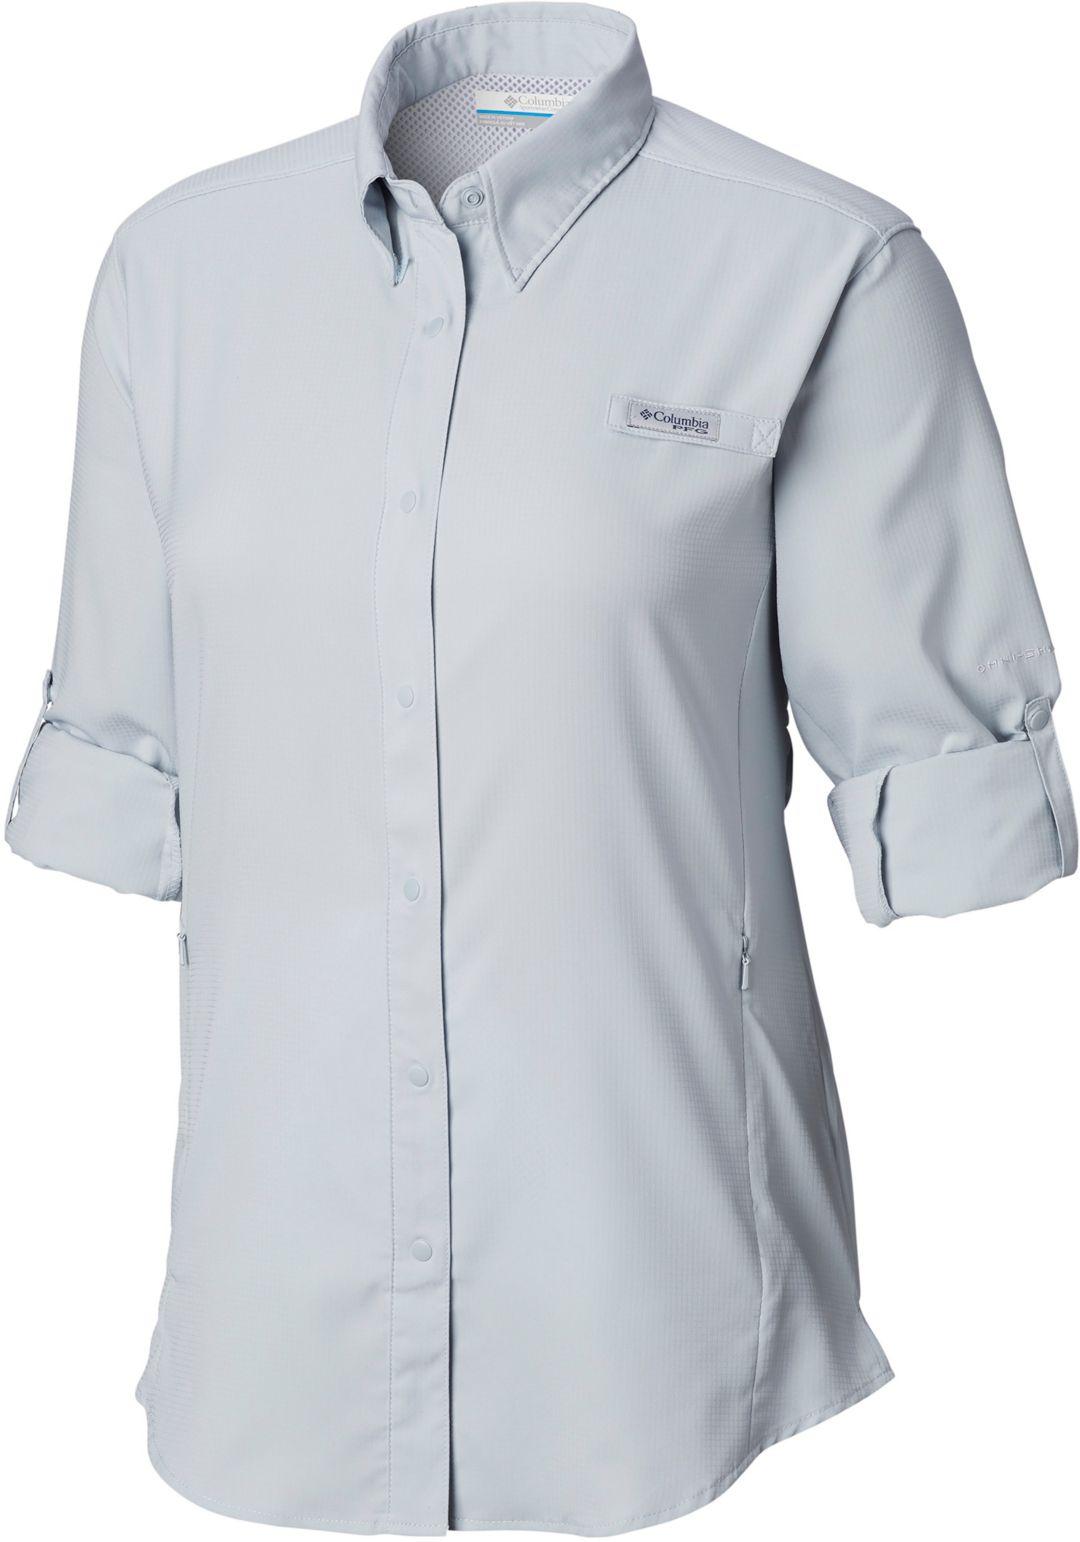 28784f0563 Columbia Women's PFG Tamiami II Long Sleeve Shirt